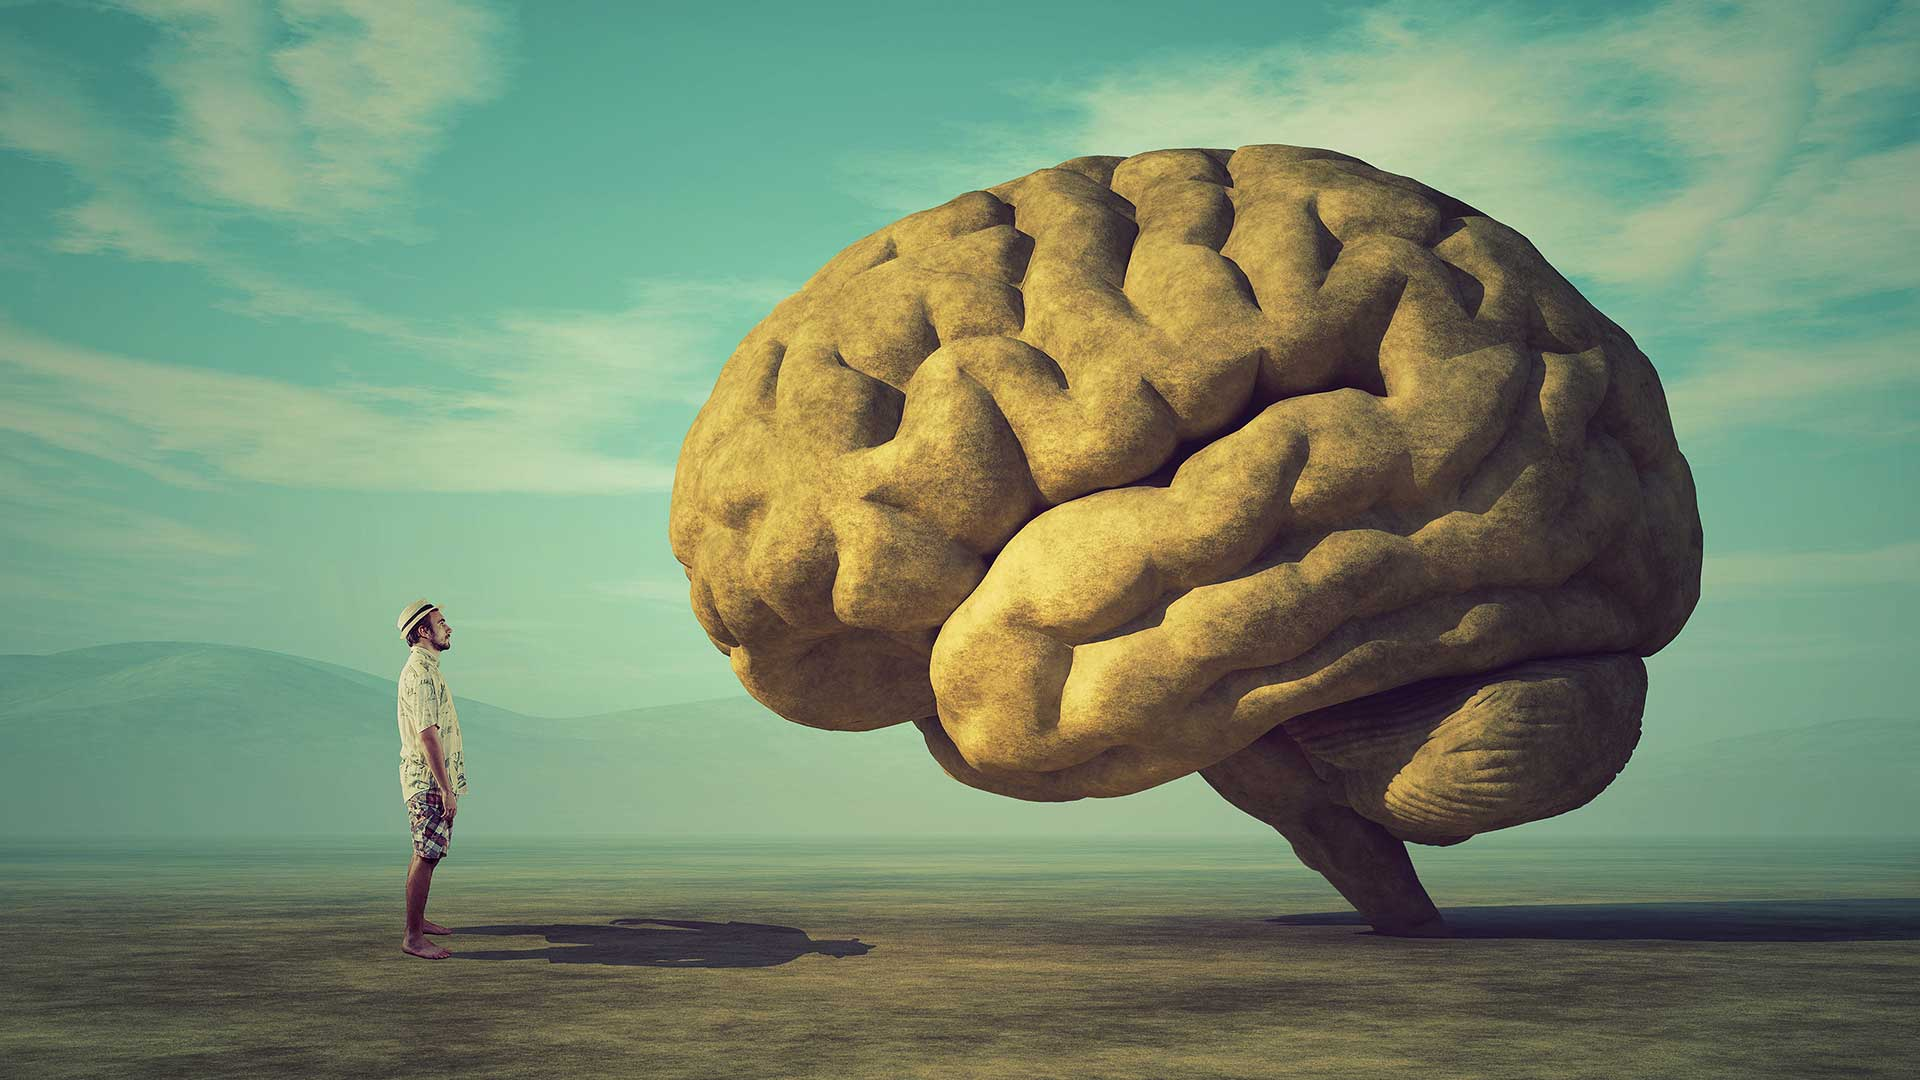 person-brain-illustration_shutterstock_032541603.jpg